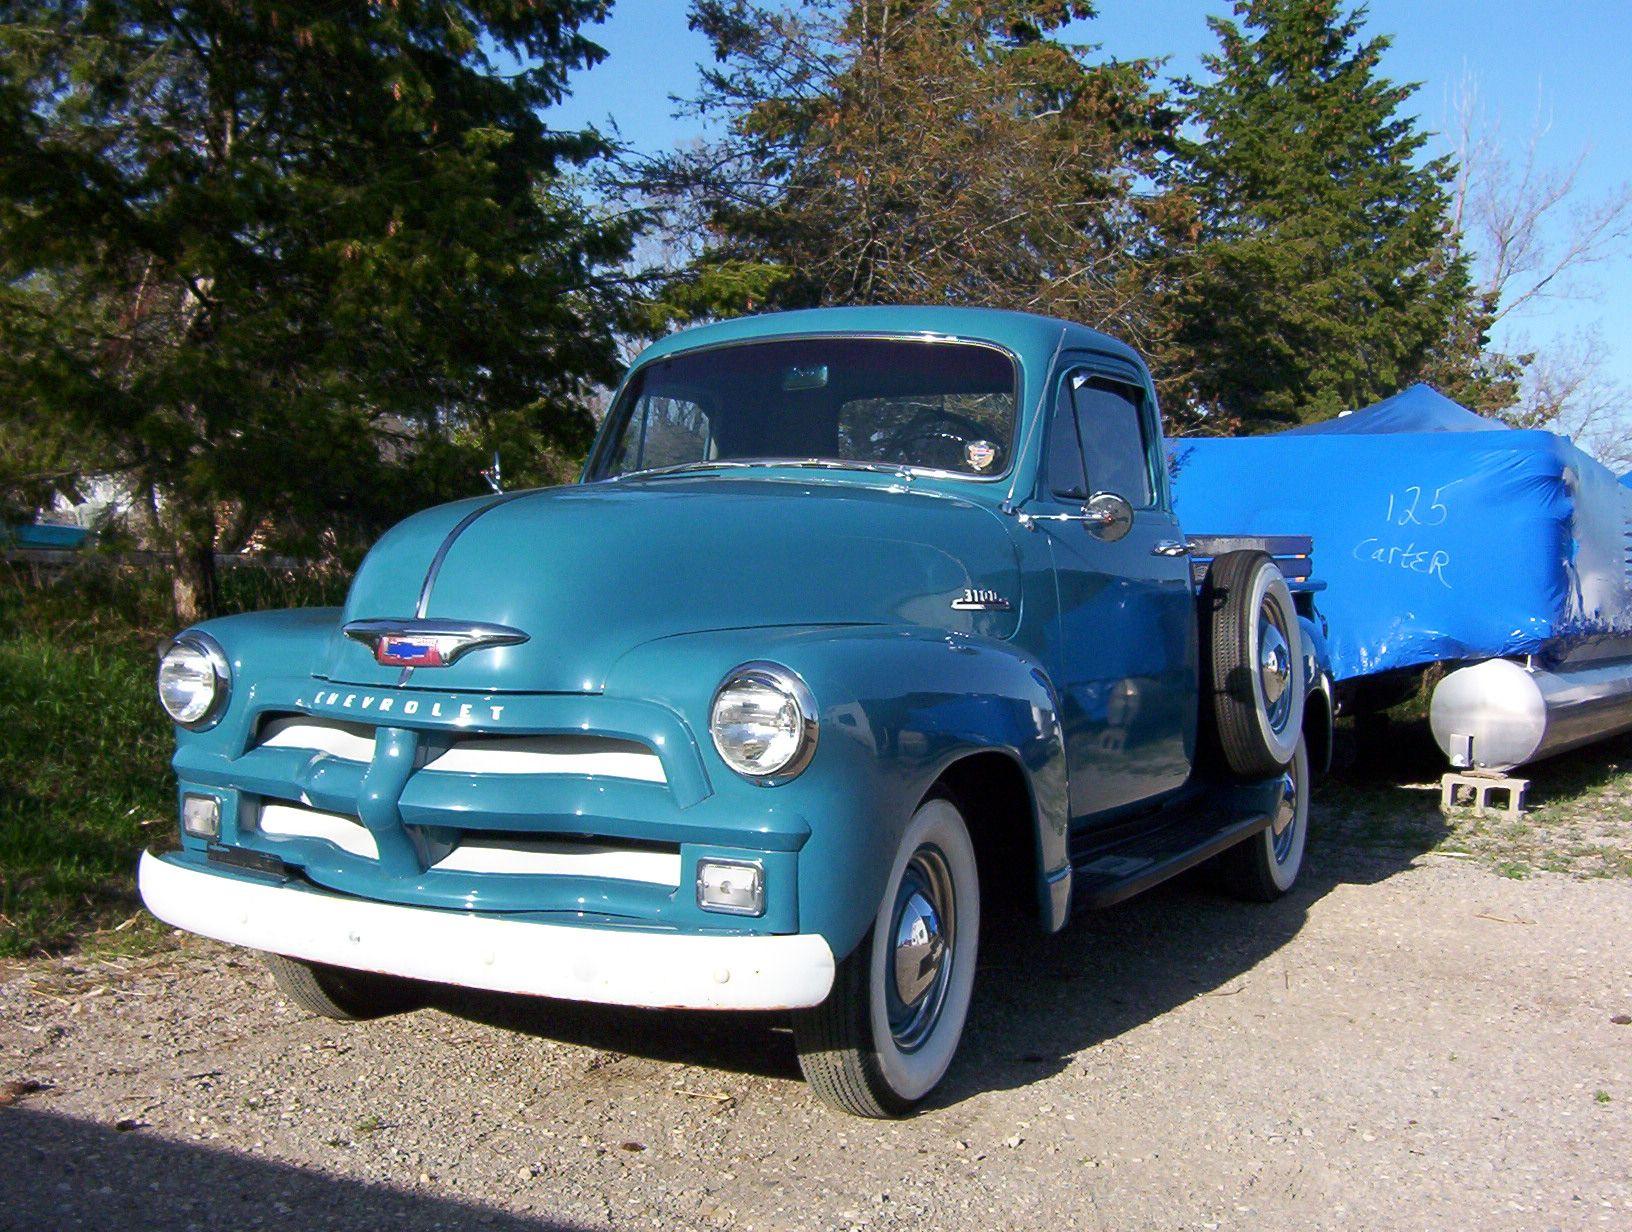 1954 chevrolet pick up truck | warren | Pinterest | Chevrolet, GMC ...